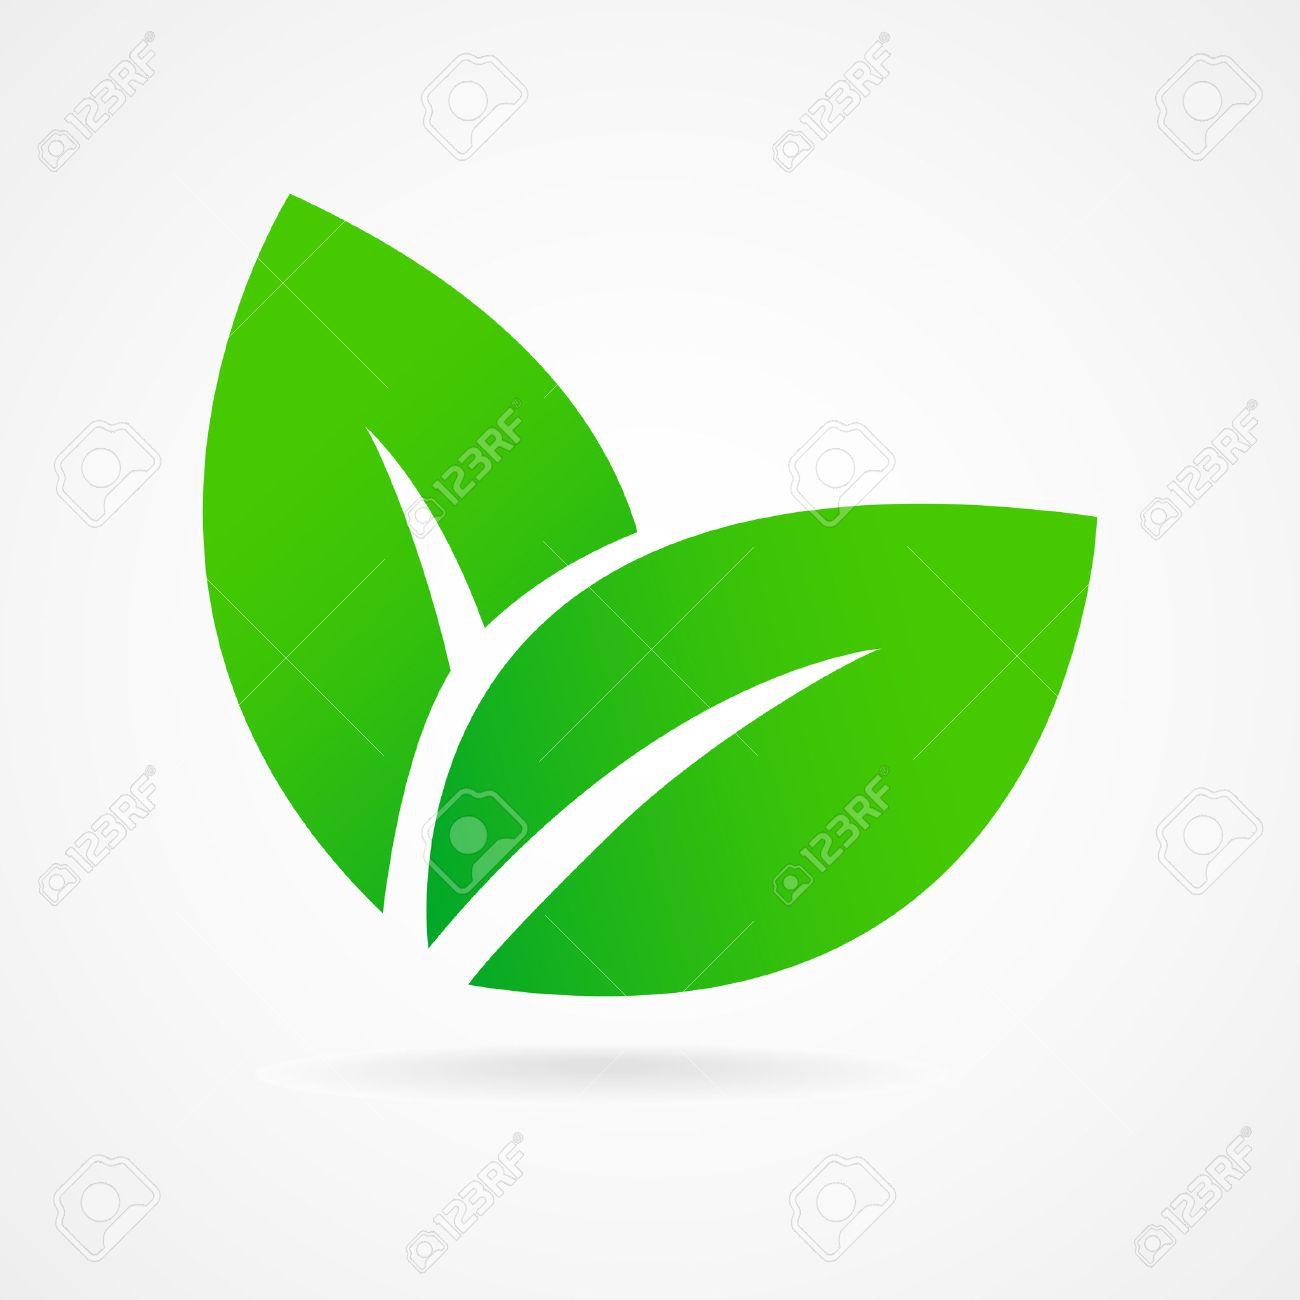 Green leaf ecology emblem isolated vector illustration - 39896475